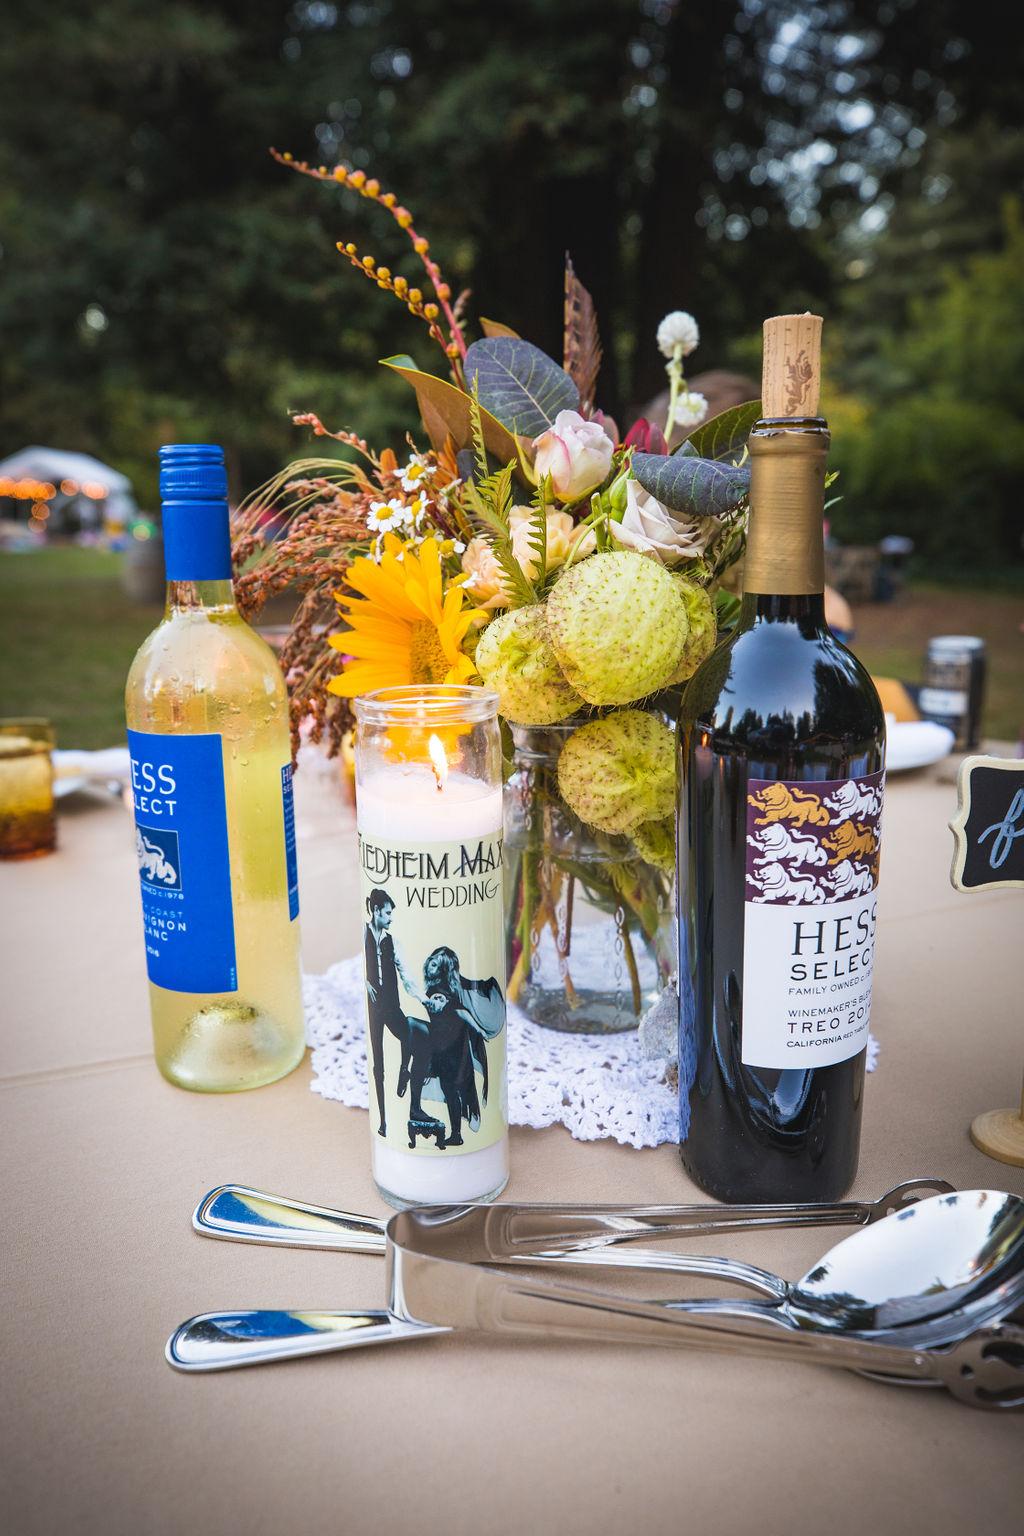 wine and flowers and fleetwood mac wedding florist